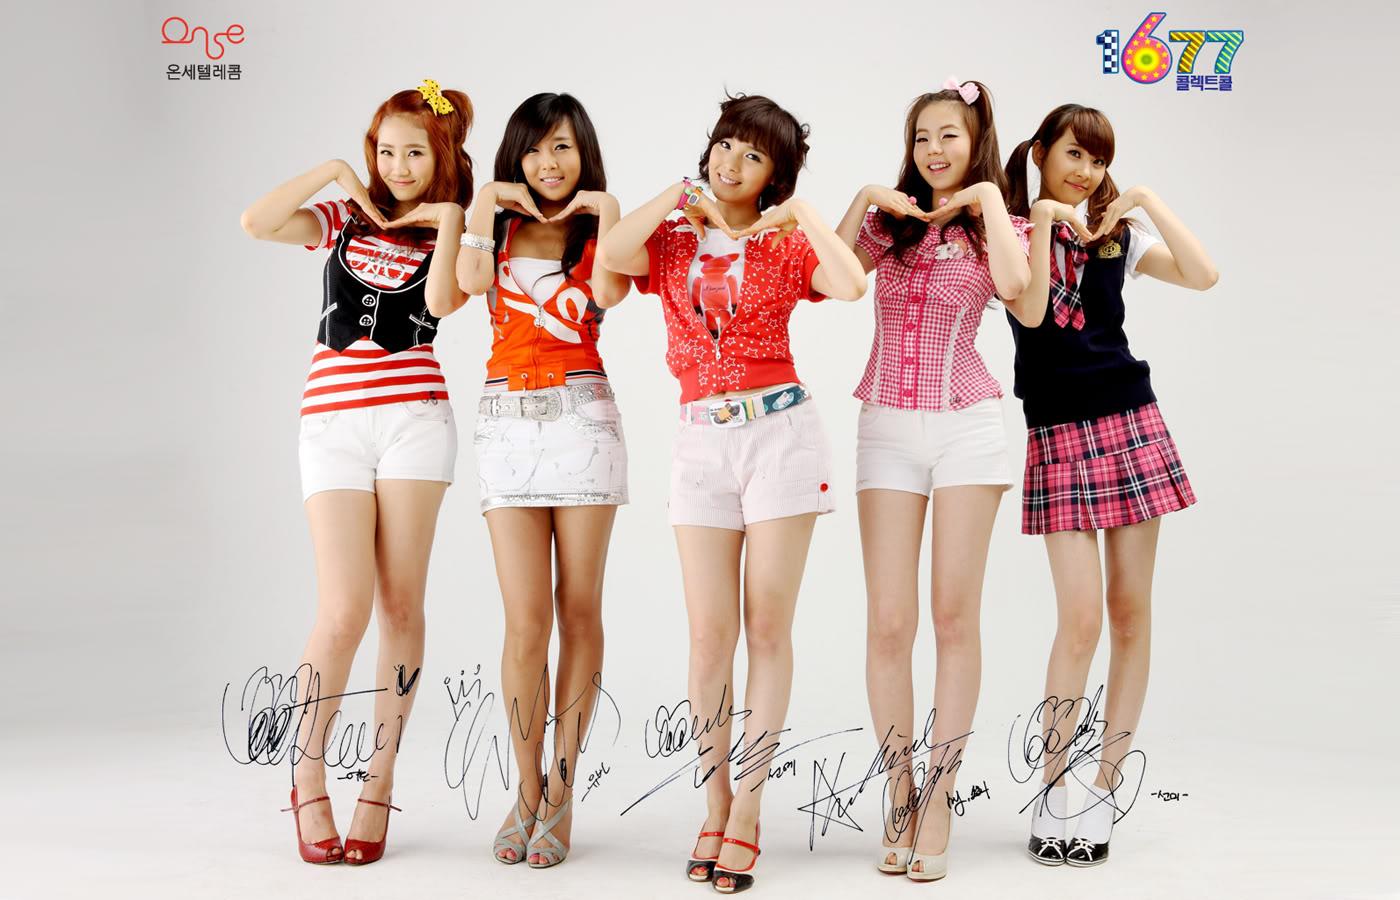 Wonder Girls Wallpaper - Wonder Girls Wallpaper